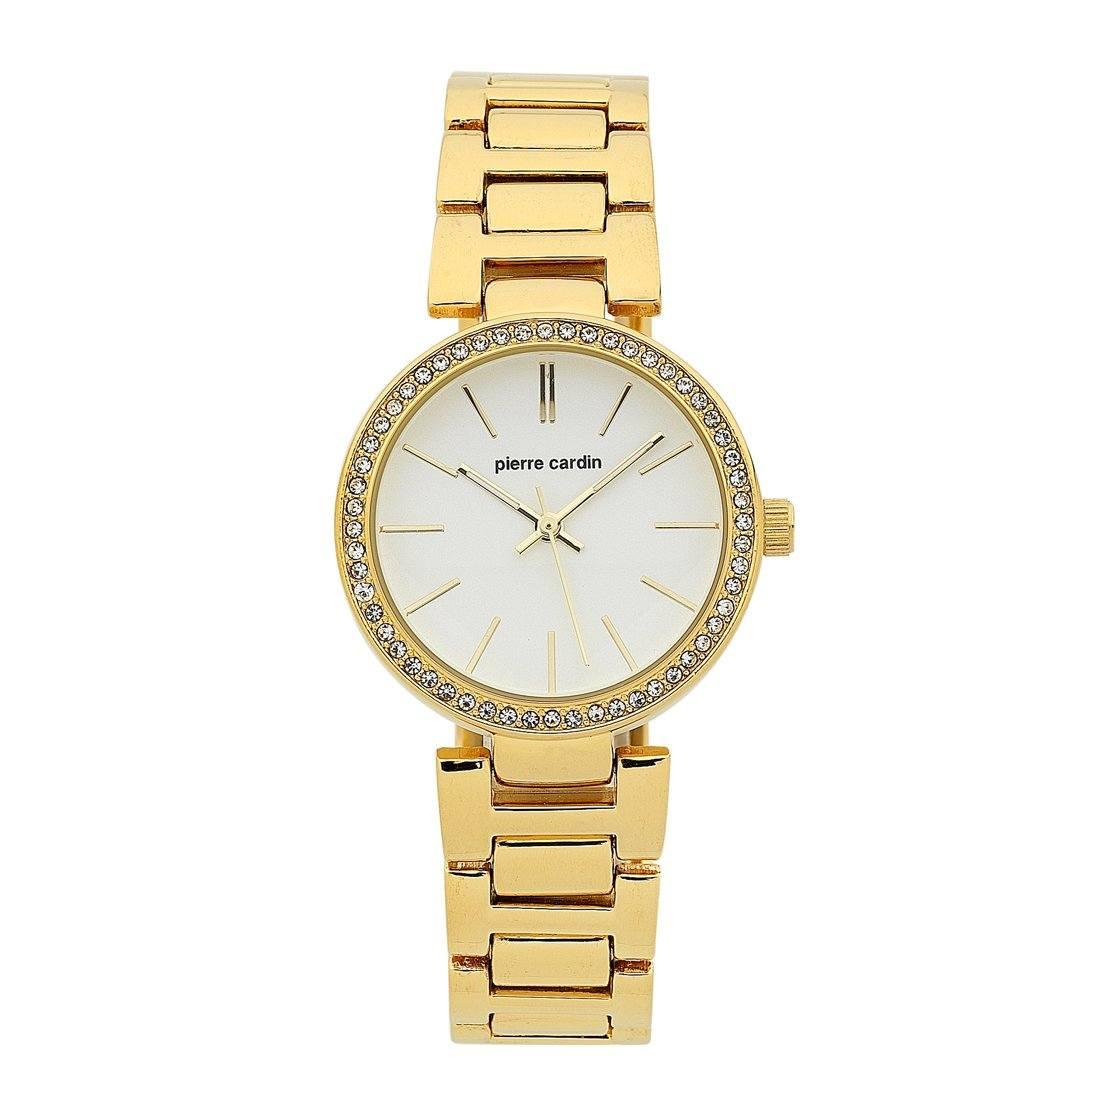 Pierre Cardin Gold Ladies Watch 5704 Stainless Steel